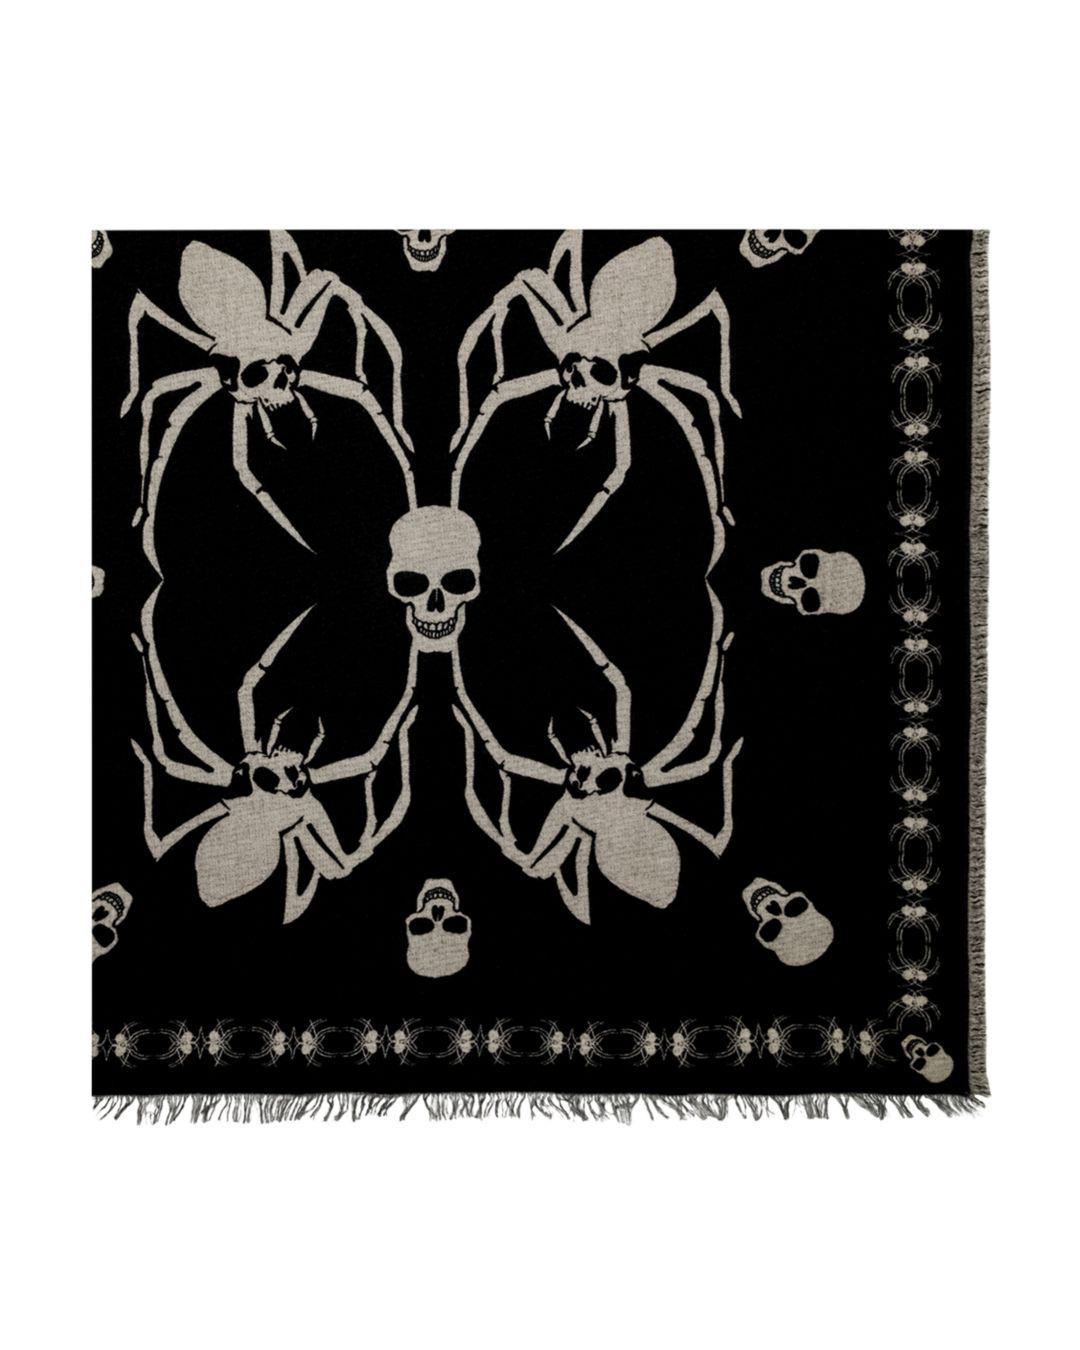 46d7c29322 The Kooples Spider-skull Square Scarf in Black for Men - Lyst